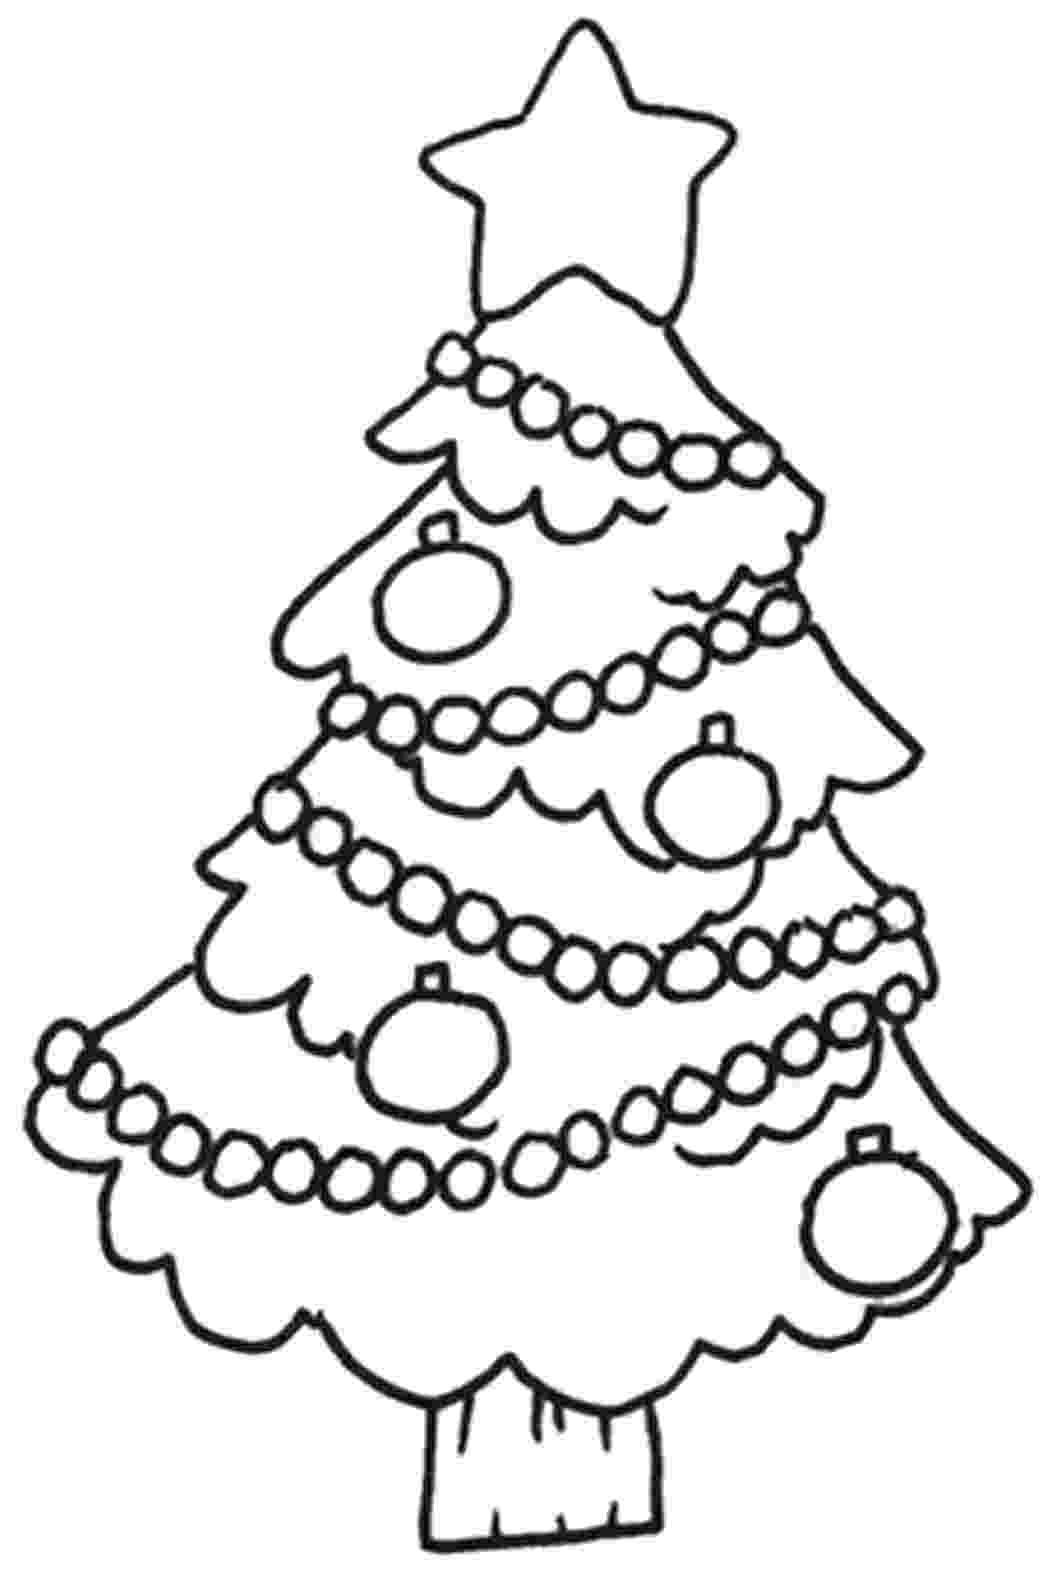 colouring templates christmas 61 best santa templates shapes crafts colouring pages christmas colouring templates